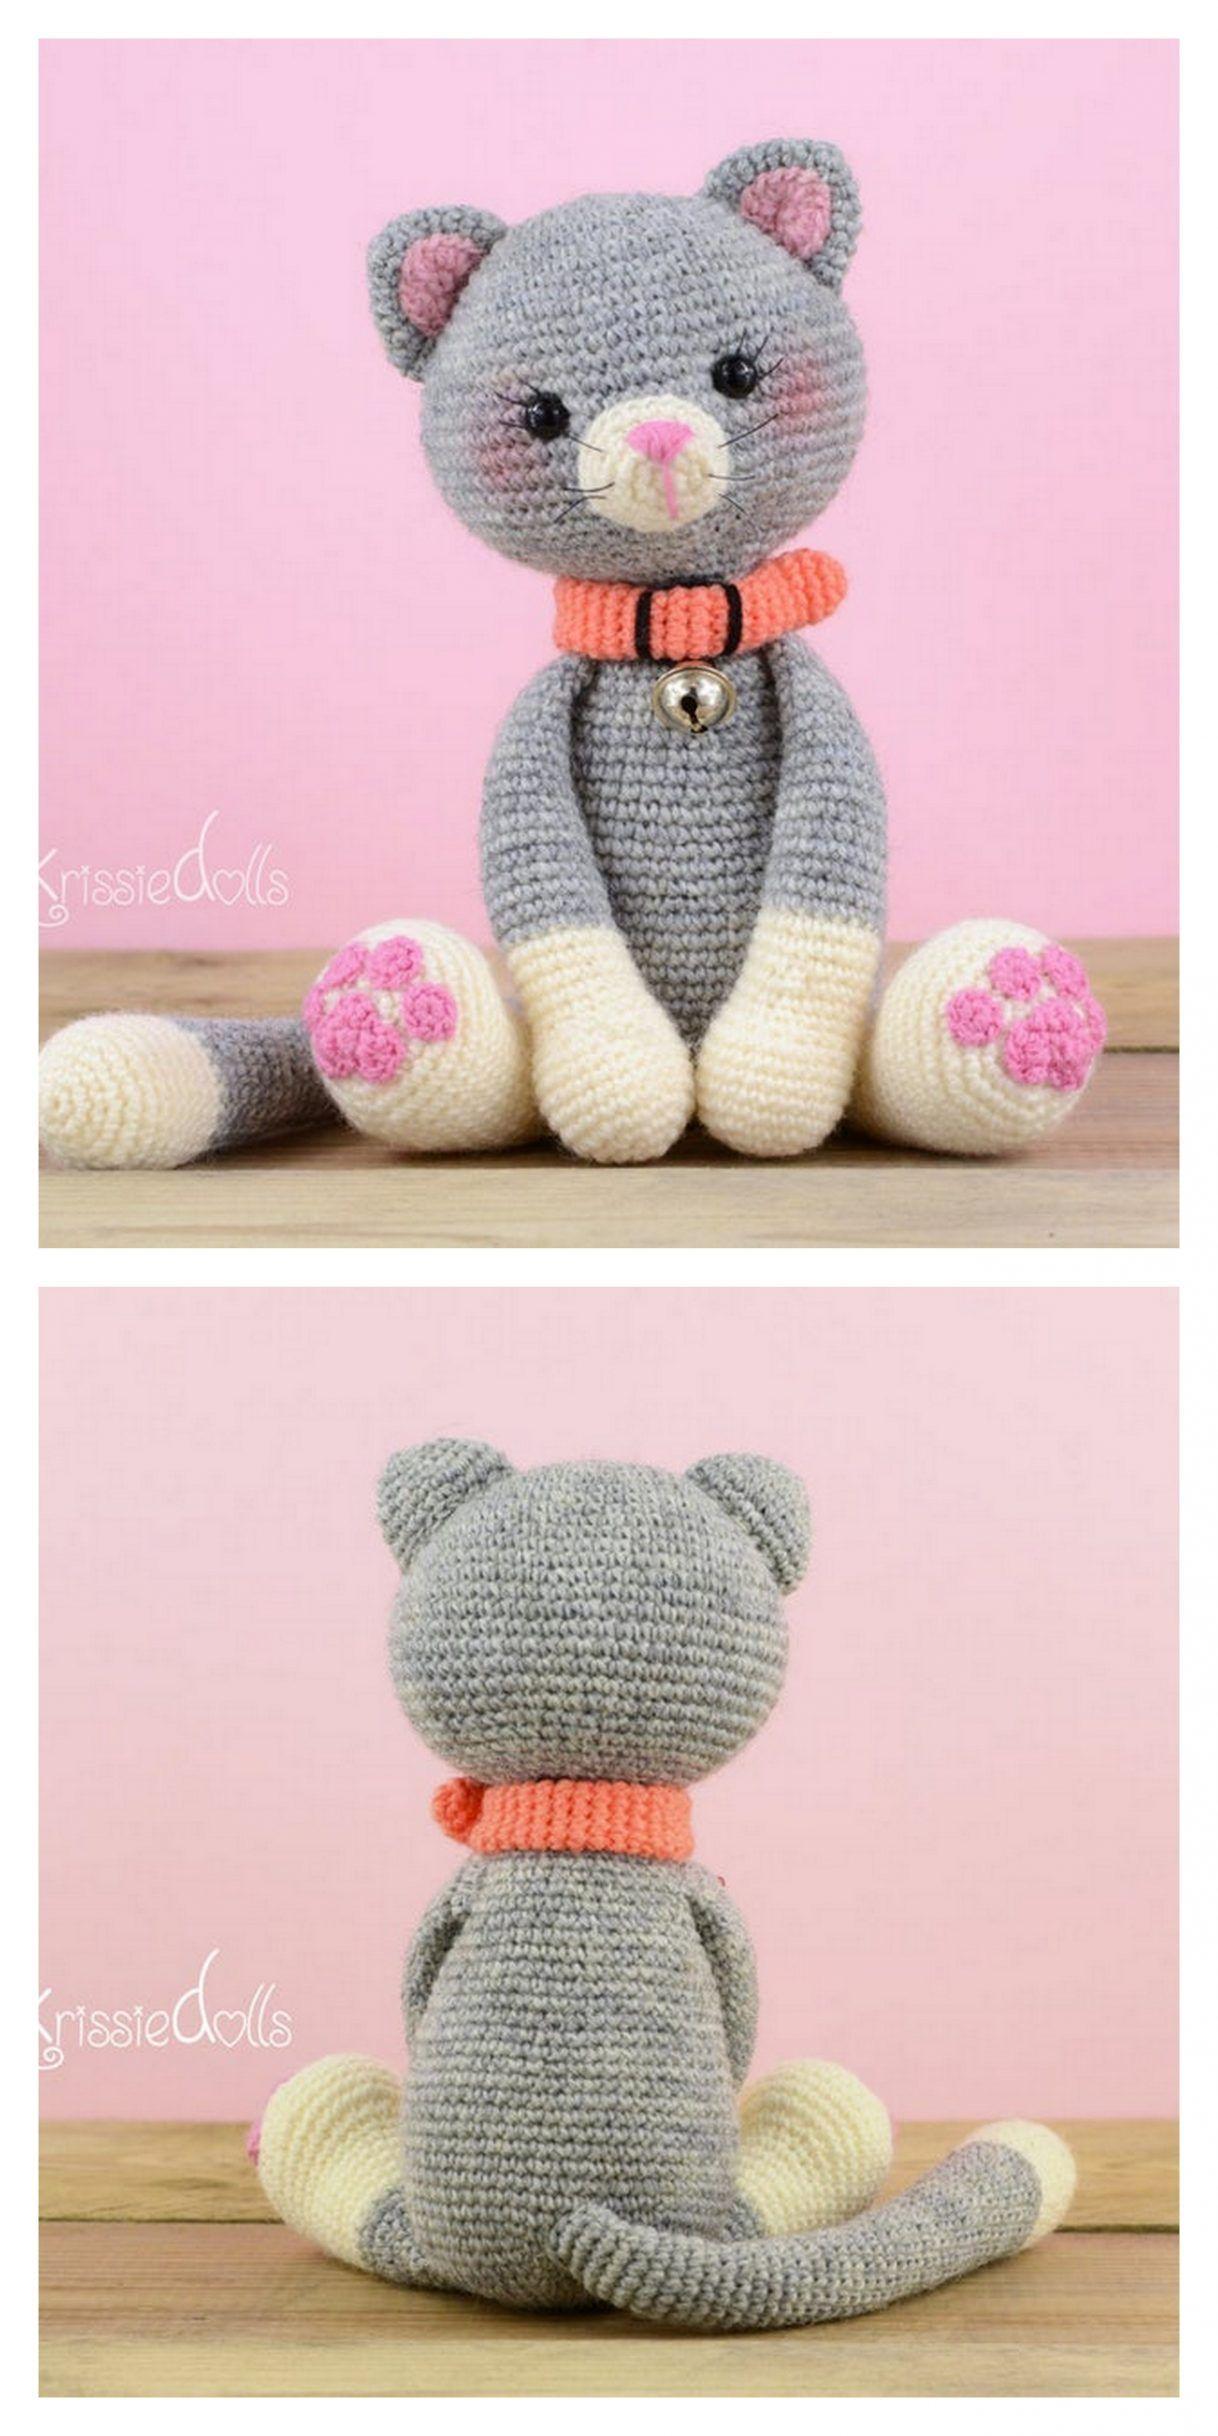 Crochet Cat Amigurumi Plush Free Pattern Free Amigurumi Patterns In 2020 Crochet Cat Amigurumi Free Pattern Crochet Cat Toys